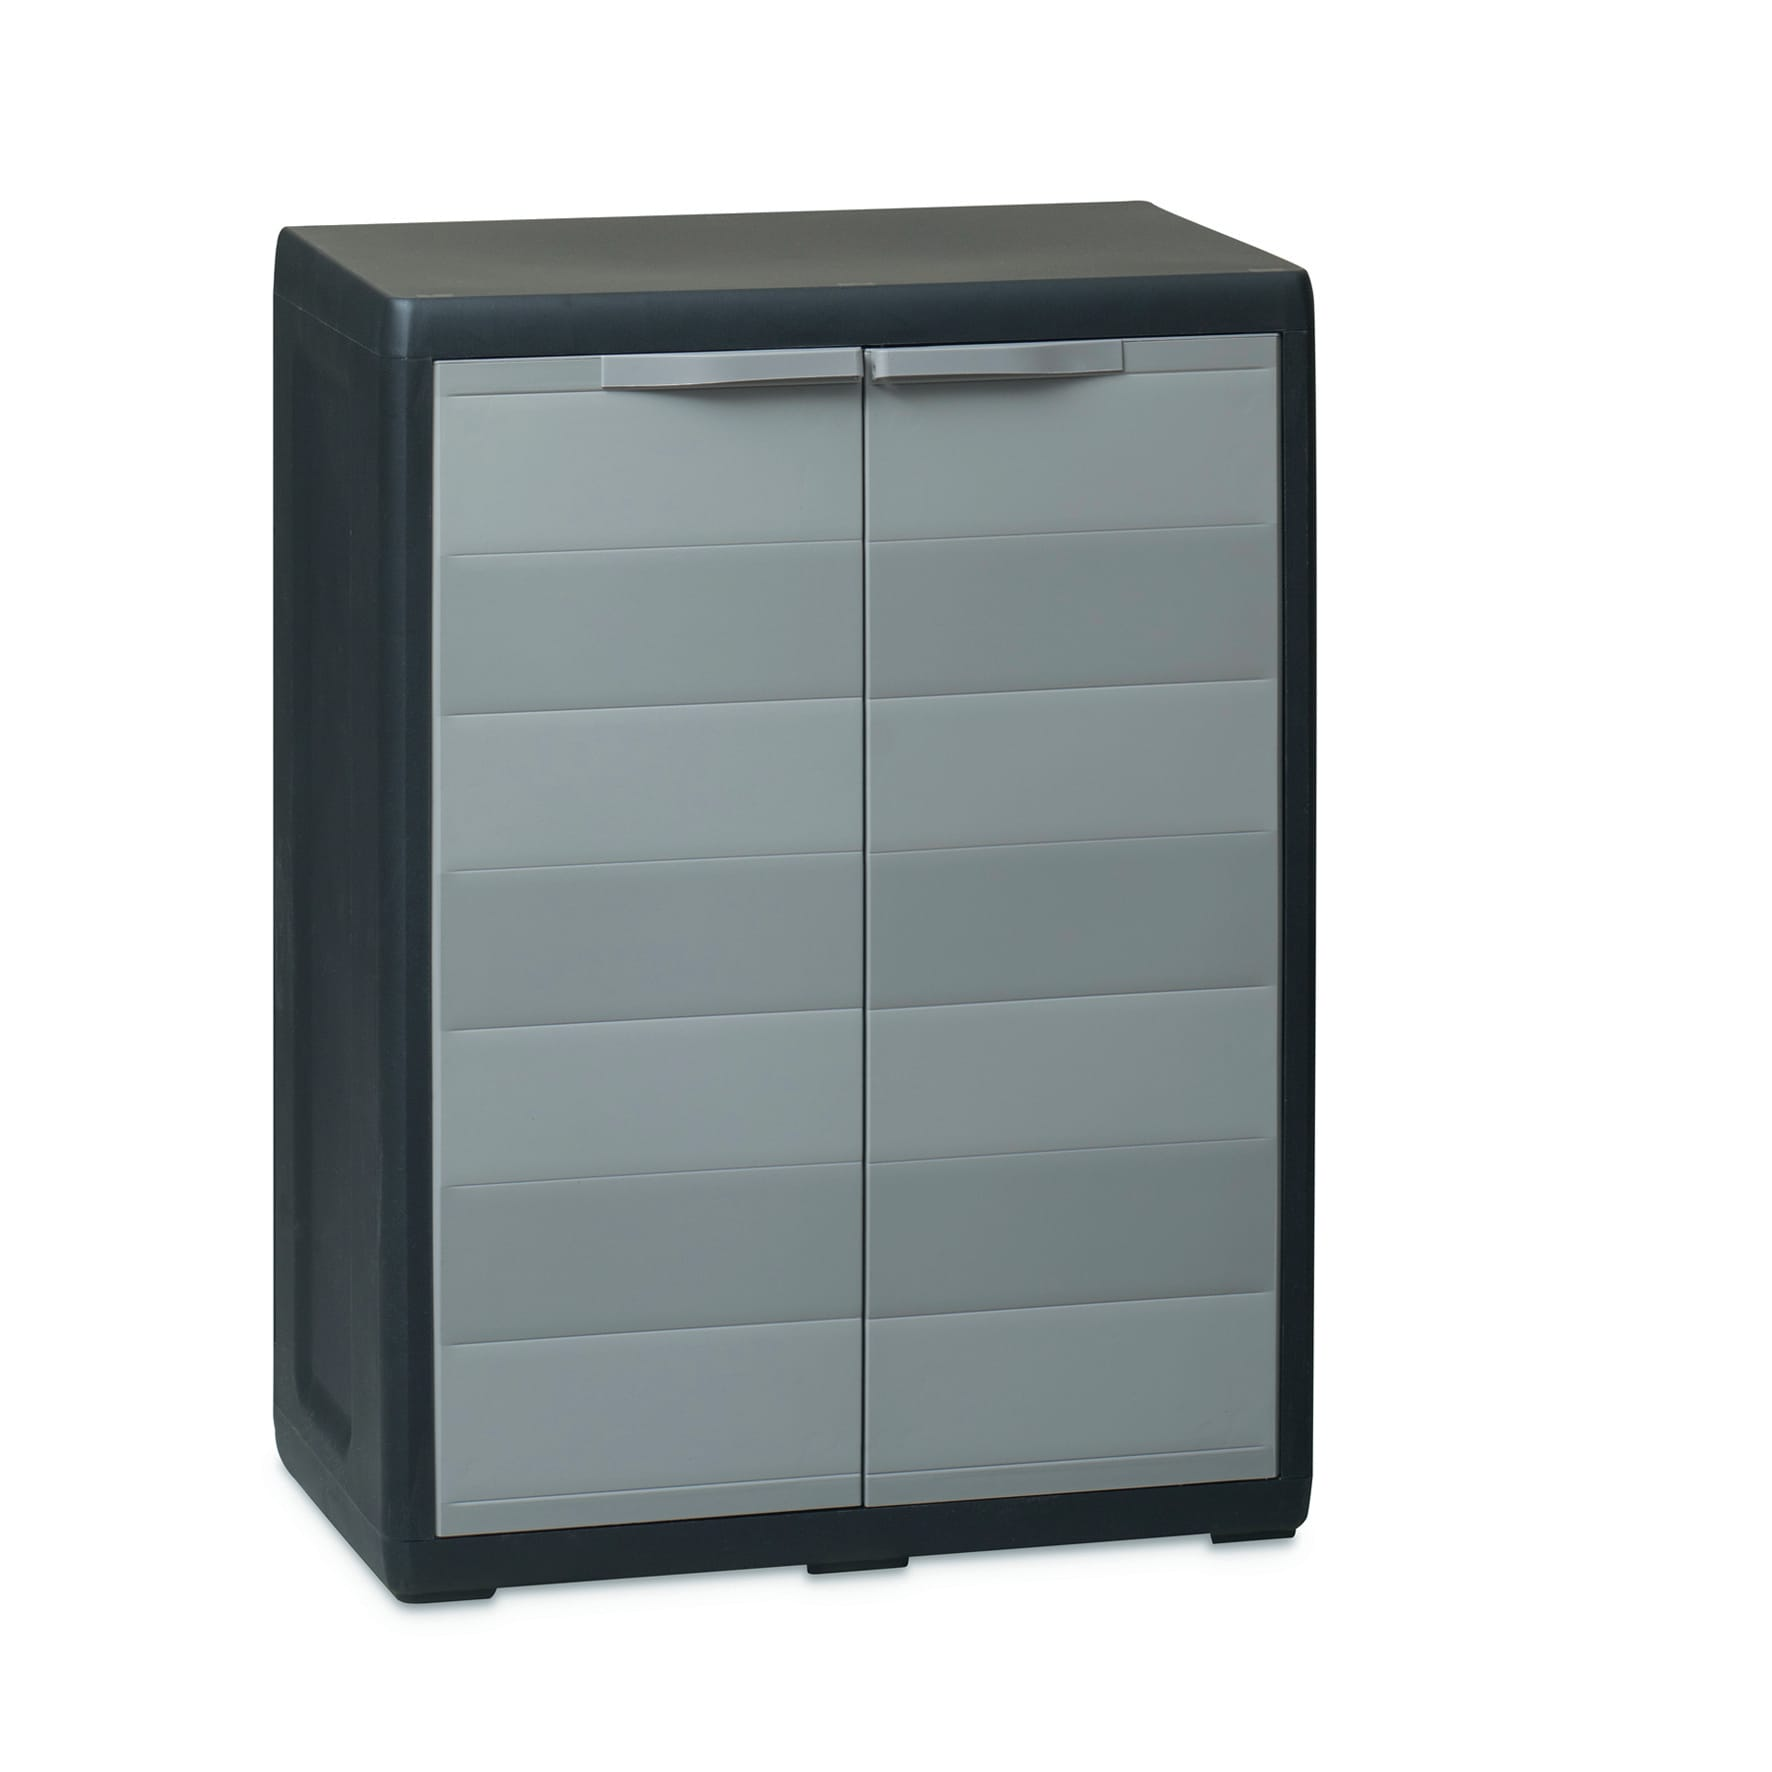 Leroy Merlin Mobili Da Balcone armadio elegance l 65 x p 38 x h 87 cm grigio e nero